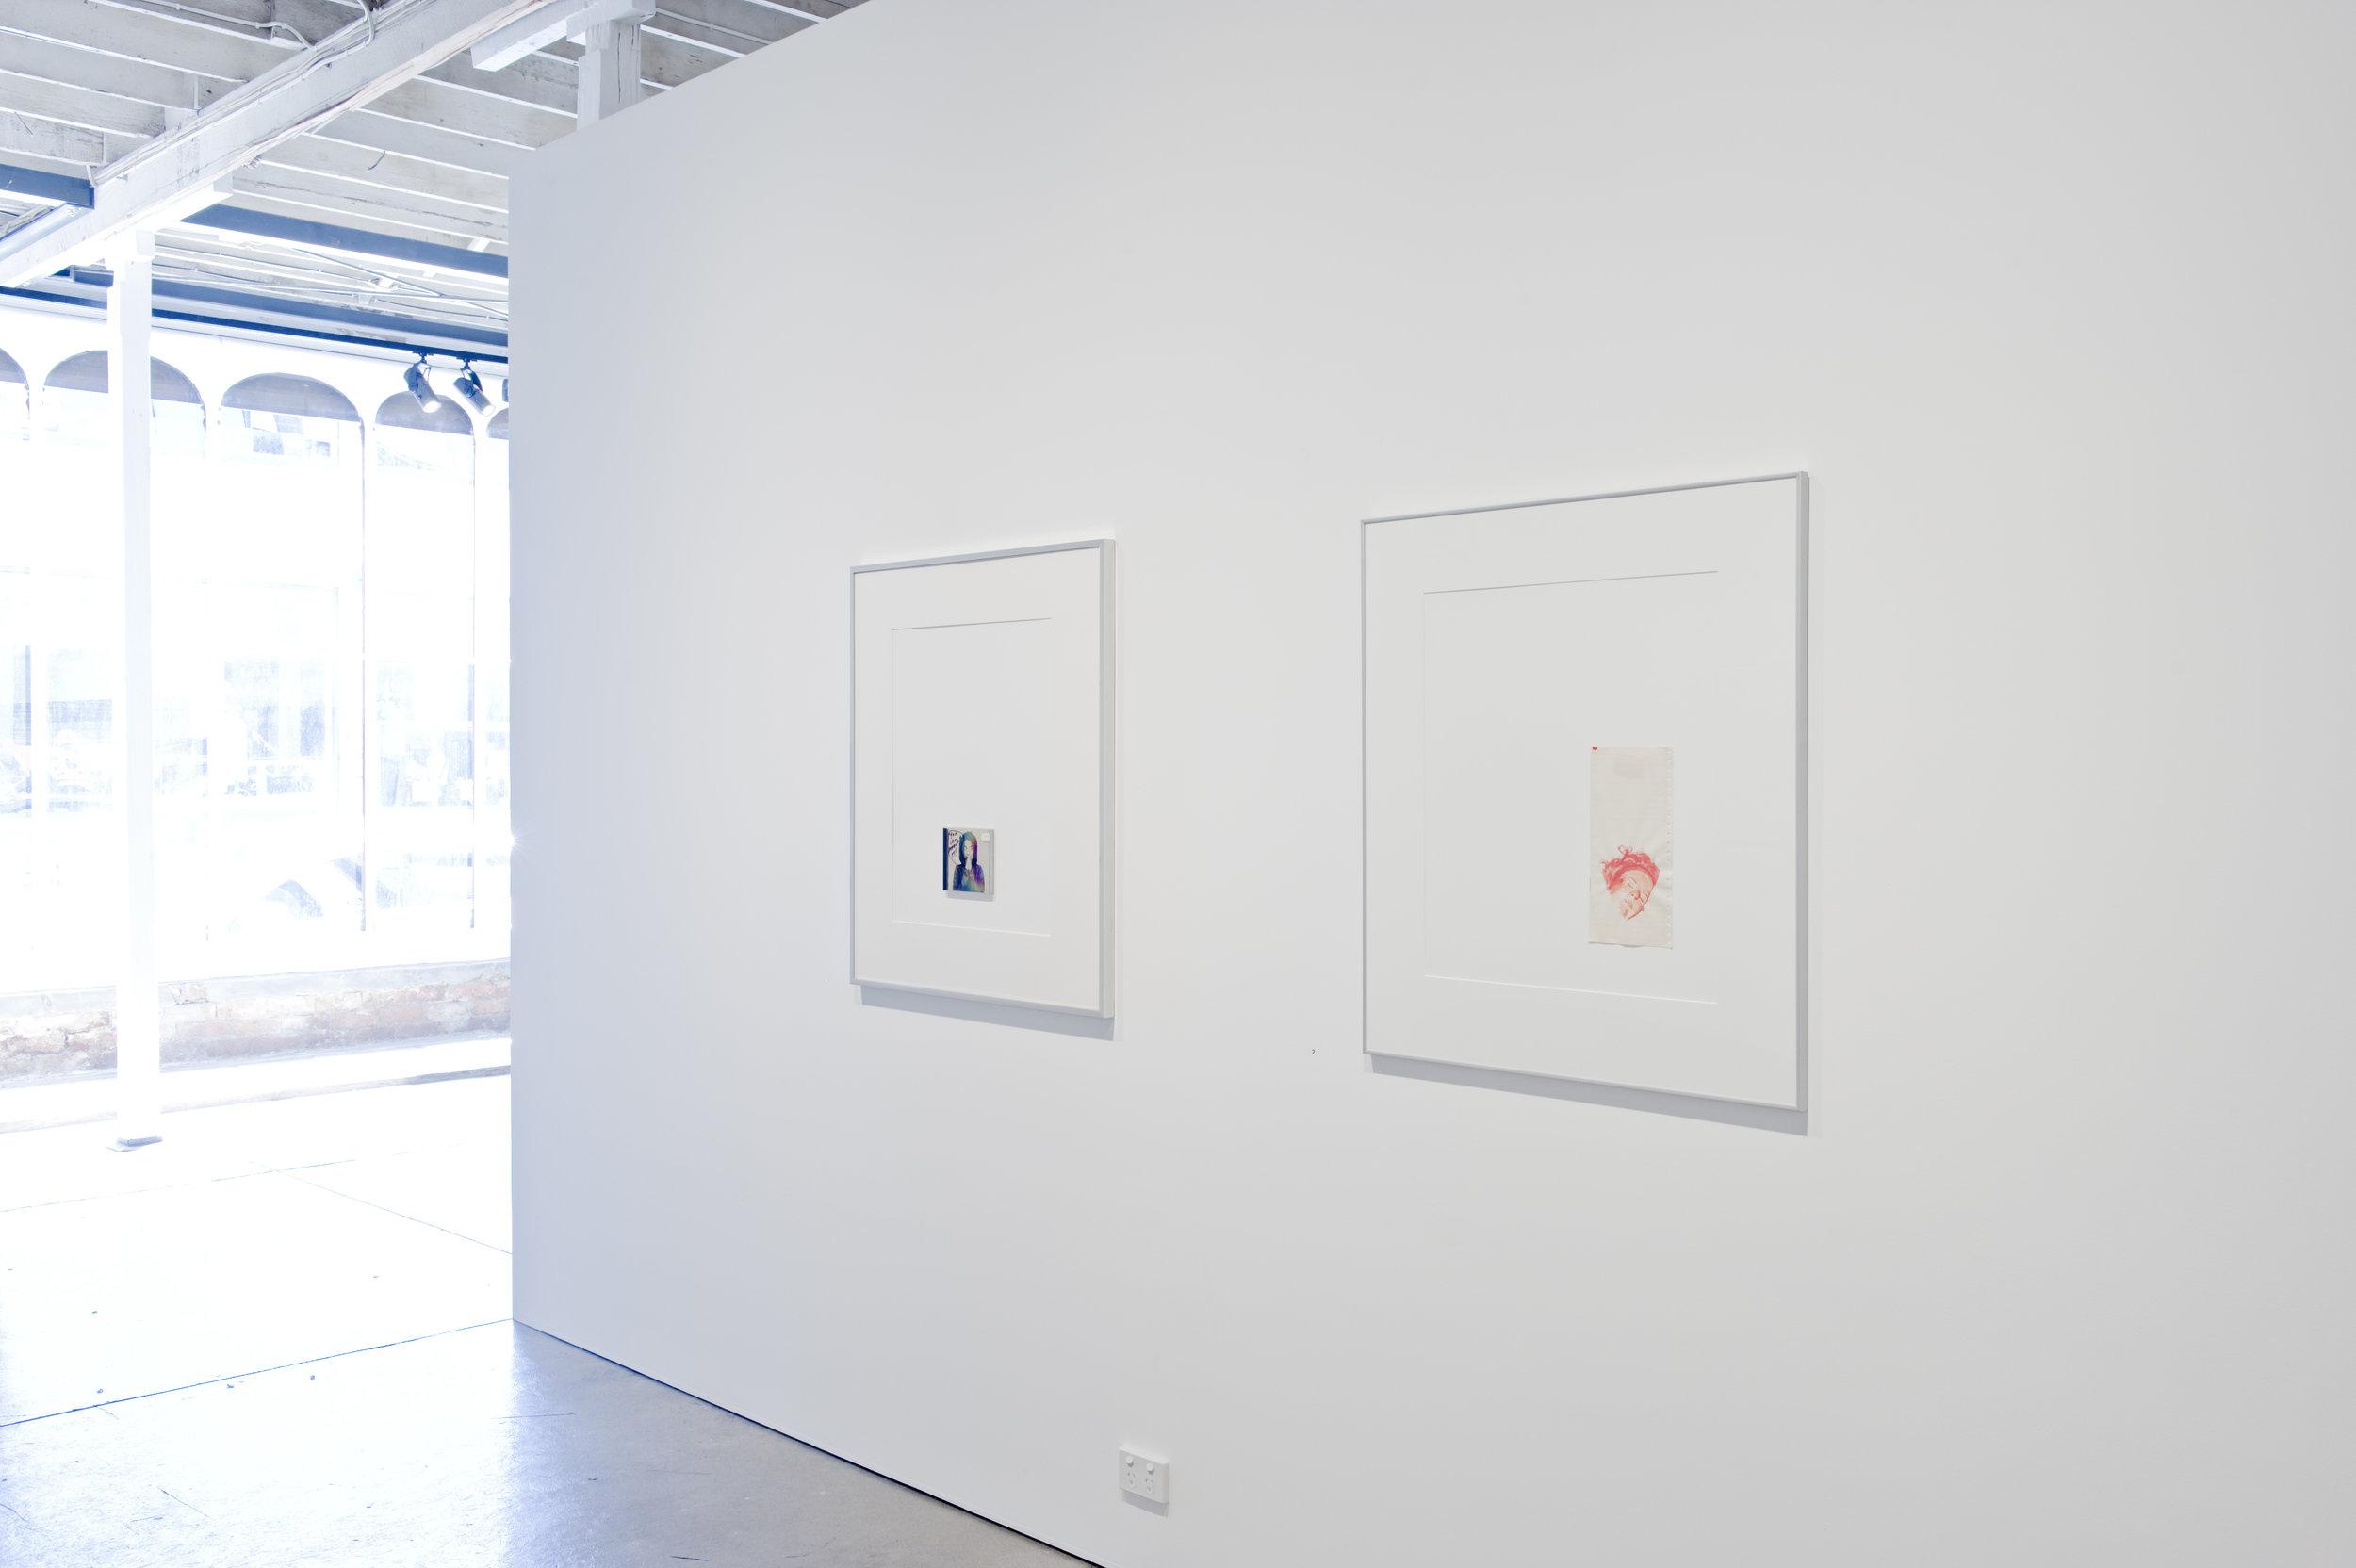 Geoff Newton, Works on Paper, 2009, instalelation image